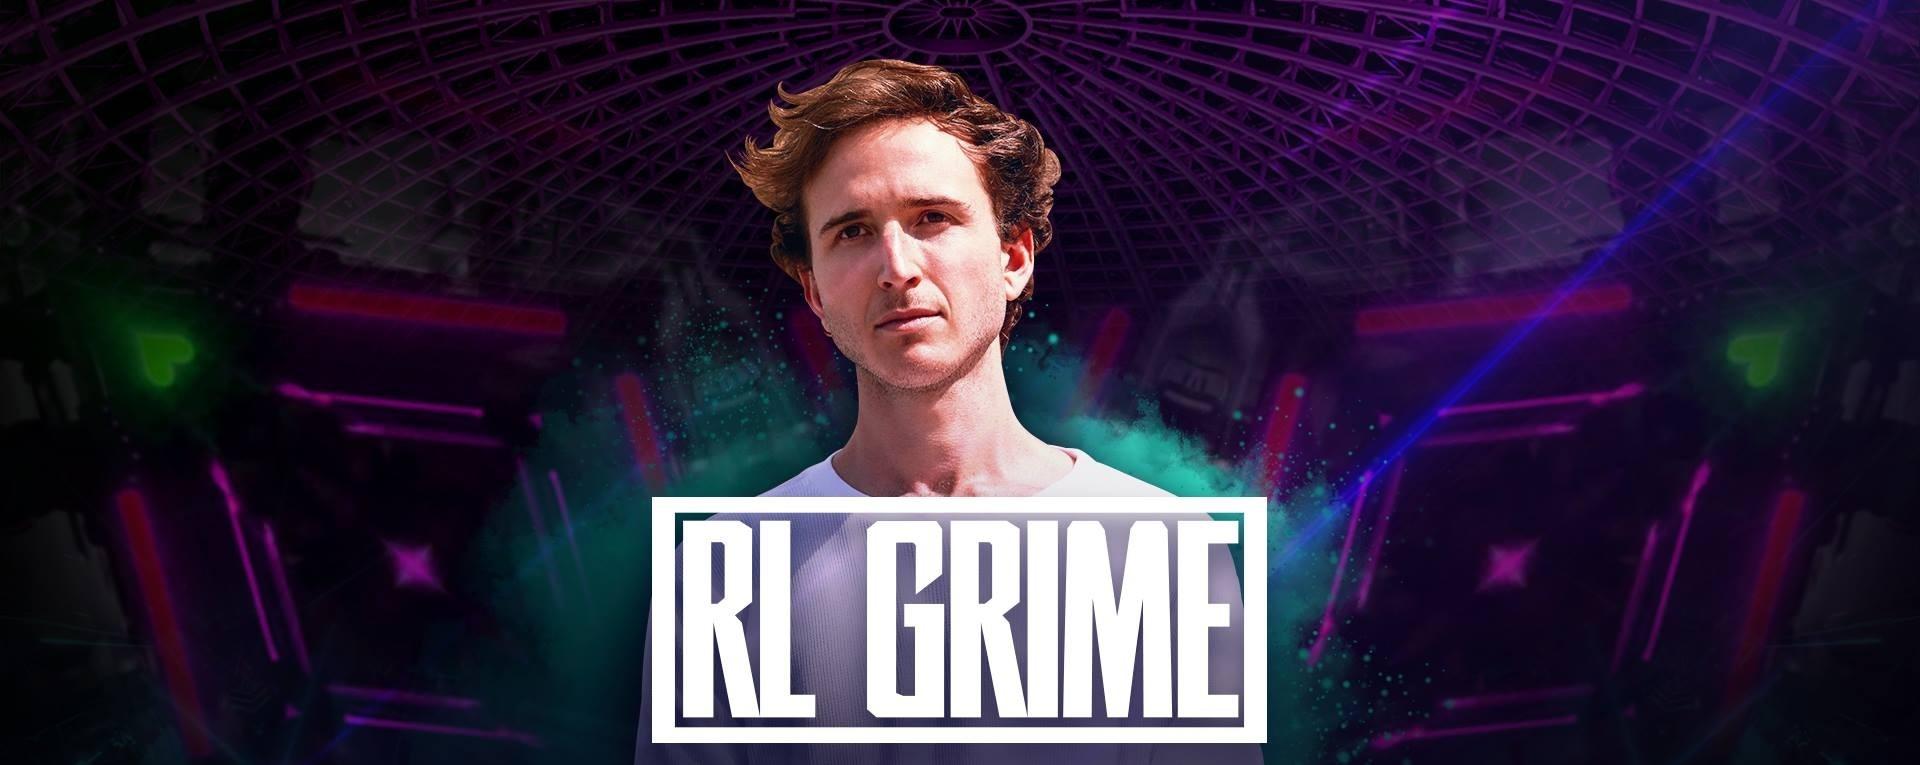 RL Grime in Cove Manila